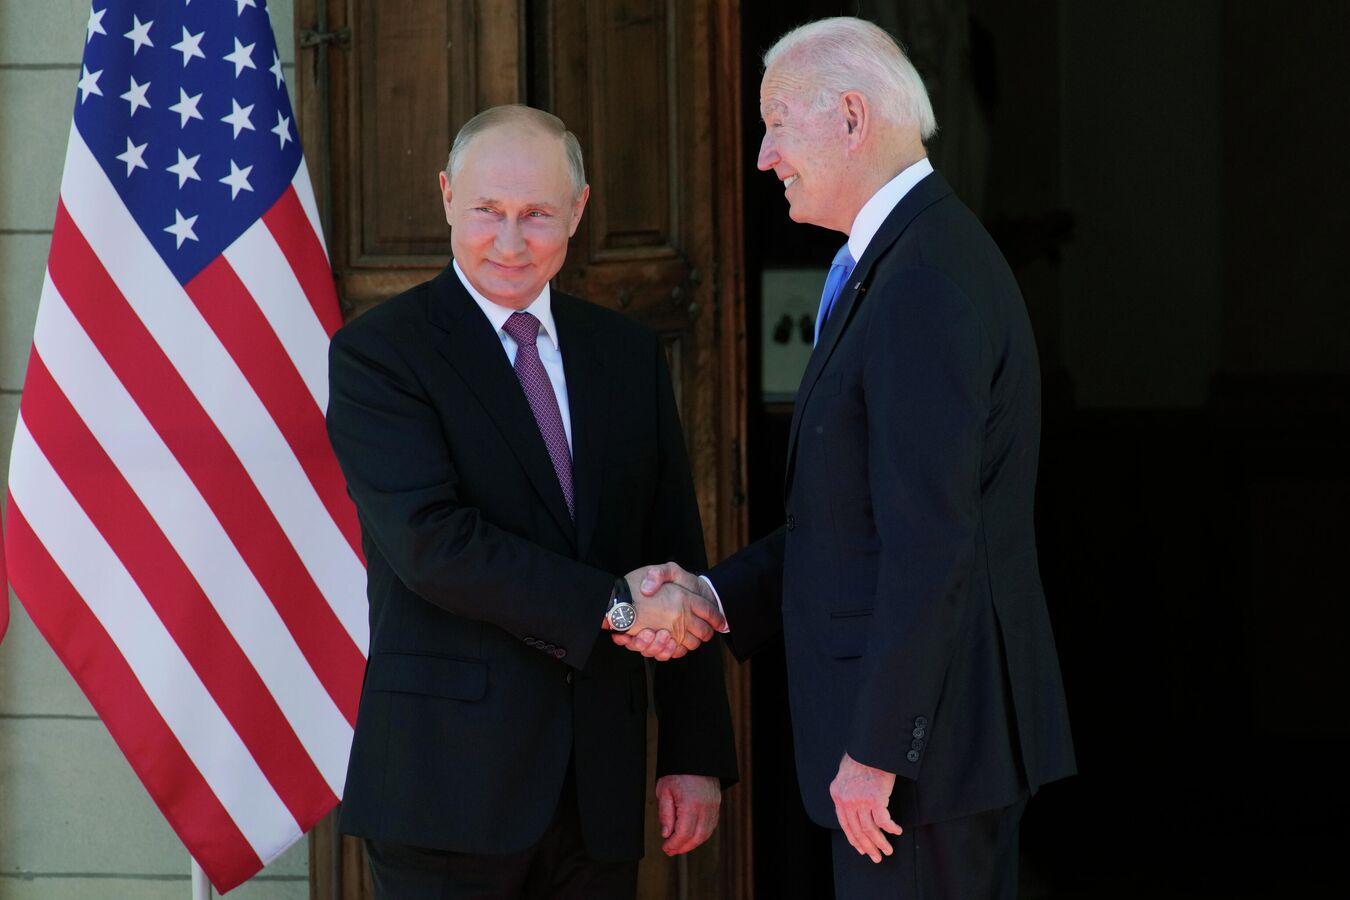 Napeto pred summit Biden-Putin: Rusi drže vojne vježbe pored Havaja, Ameri digli F-22, Američki i Ruski bombarderi lete Baltikom. 1737230308_0:0:3071:2047_1440x900_80_0_1_de67059428279350c3b7214078126fc4